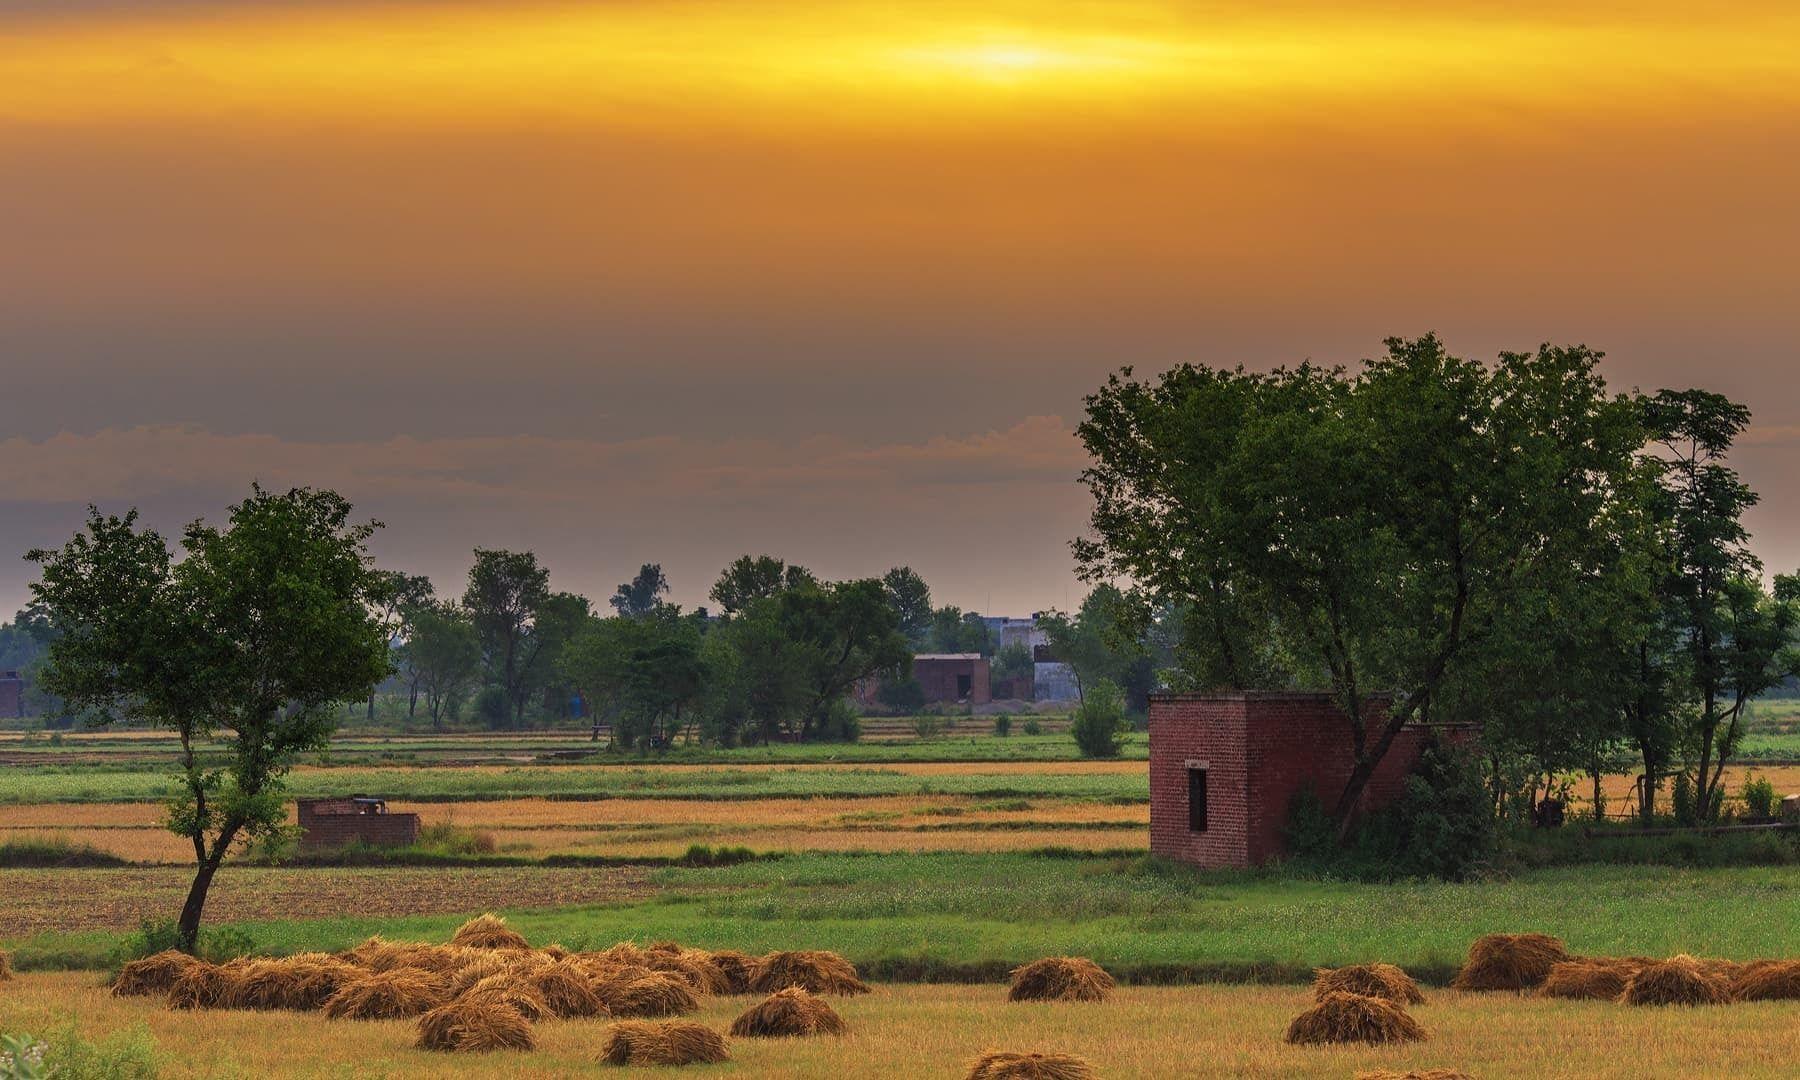 Marala Village